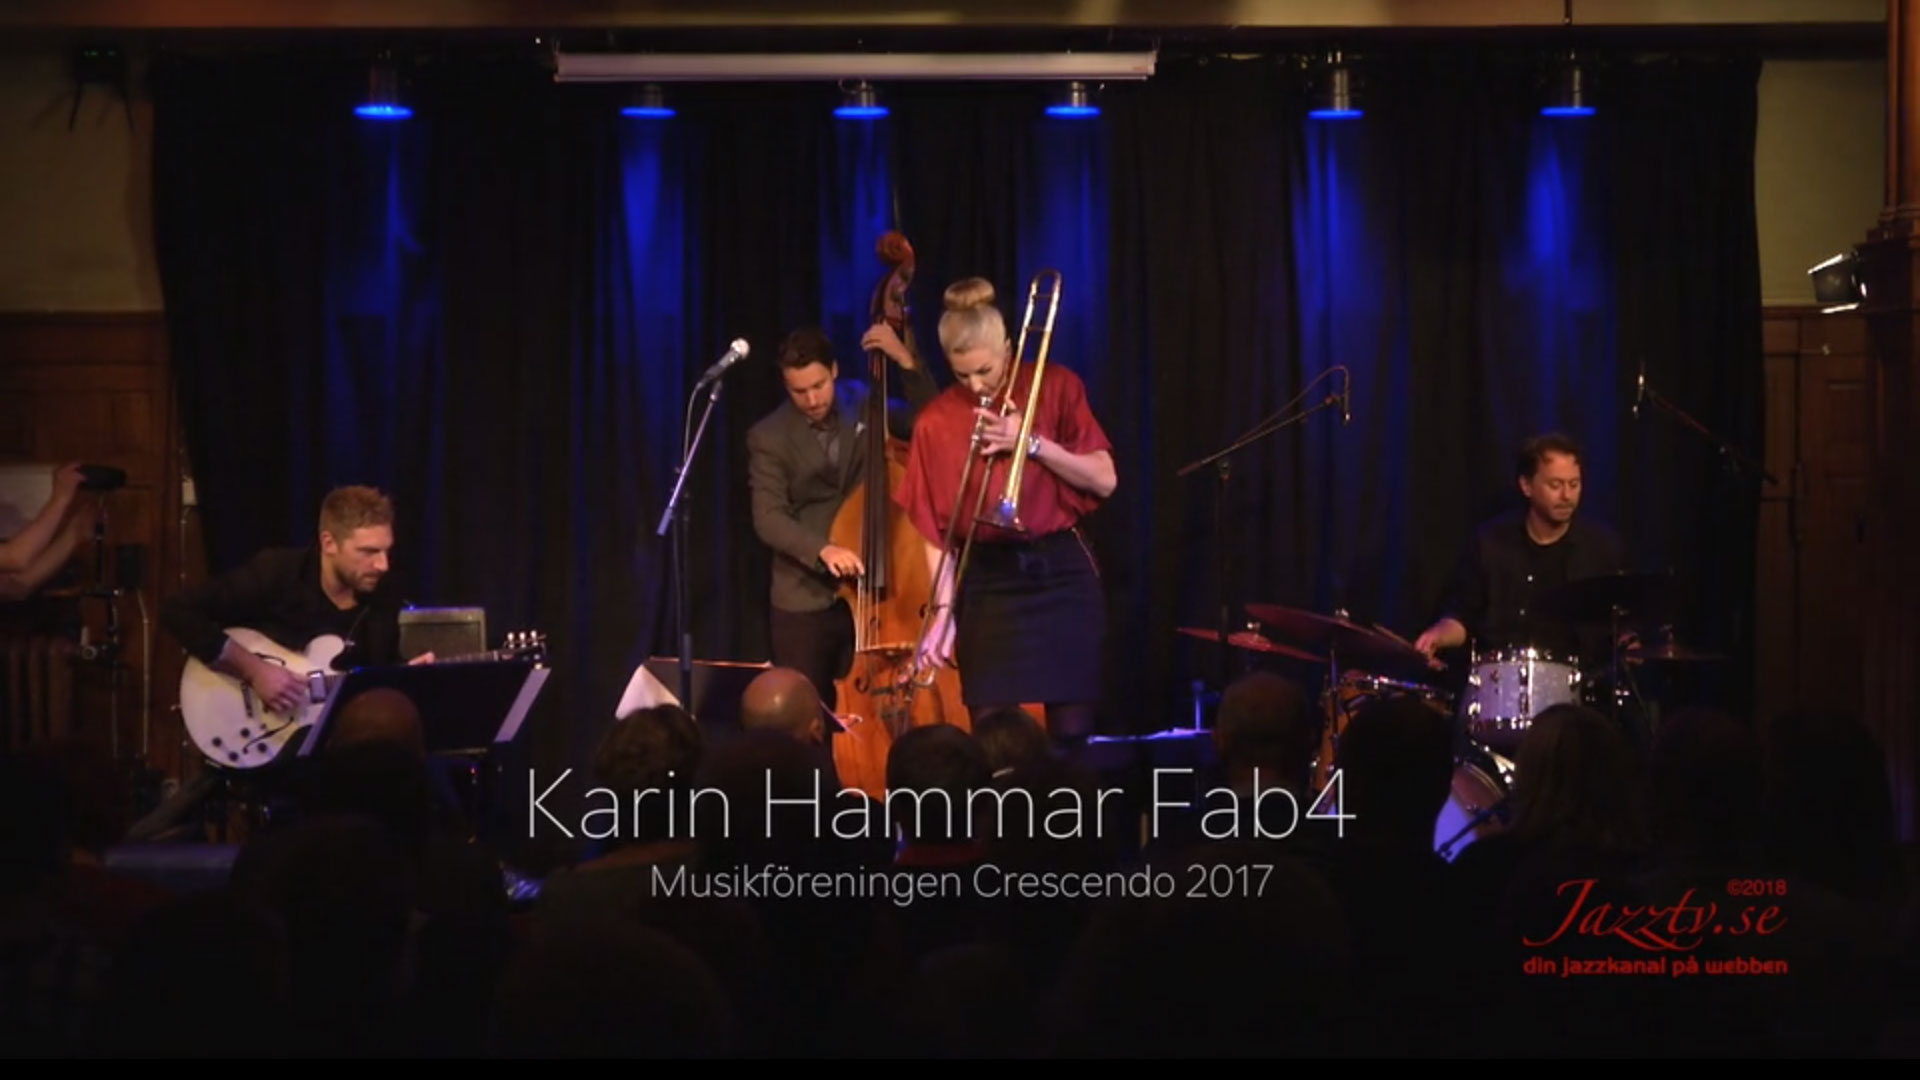 Karin Hammar Fab 4